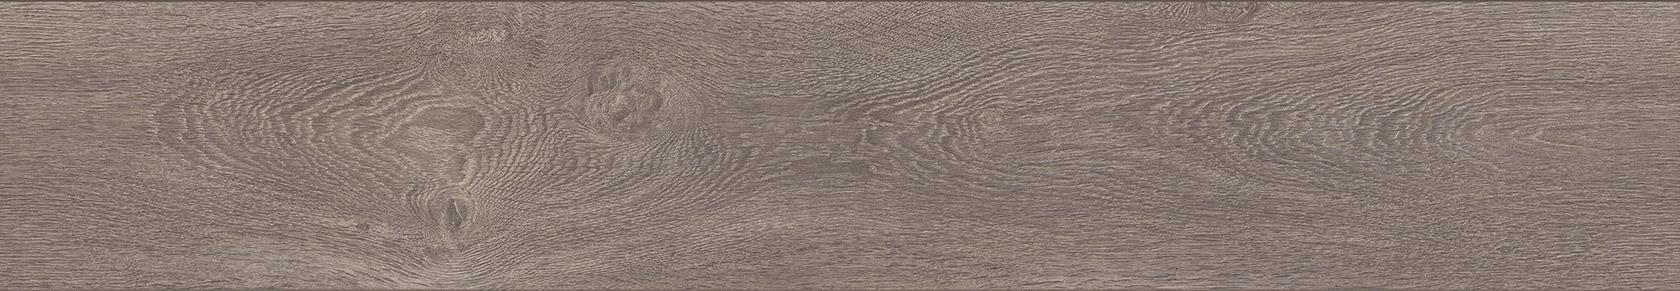 Wide Plank Fremont